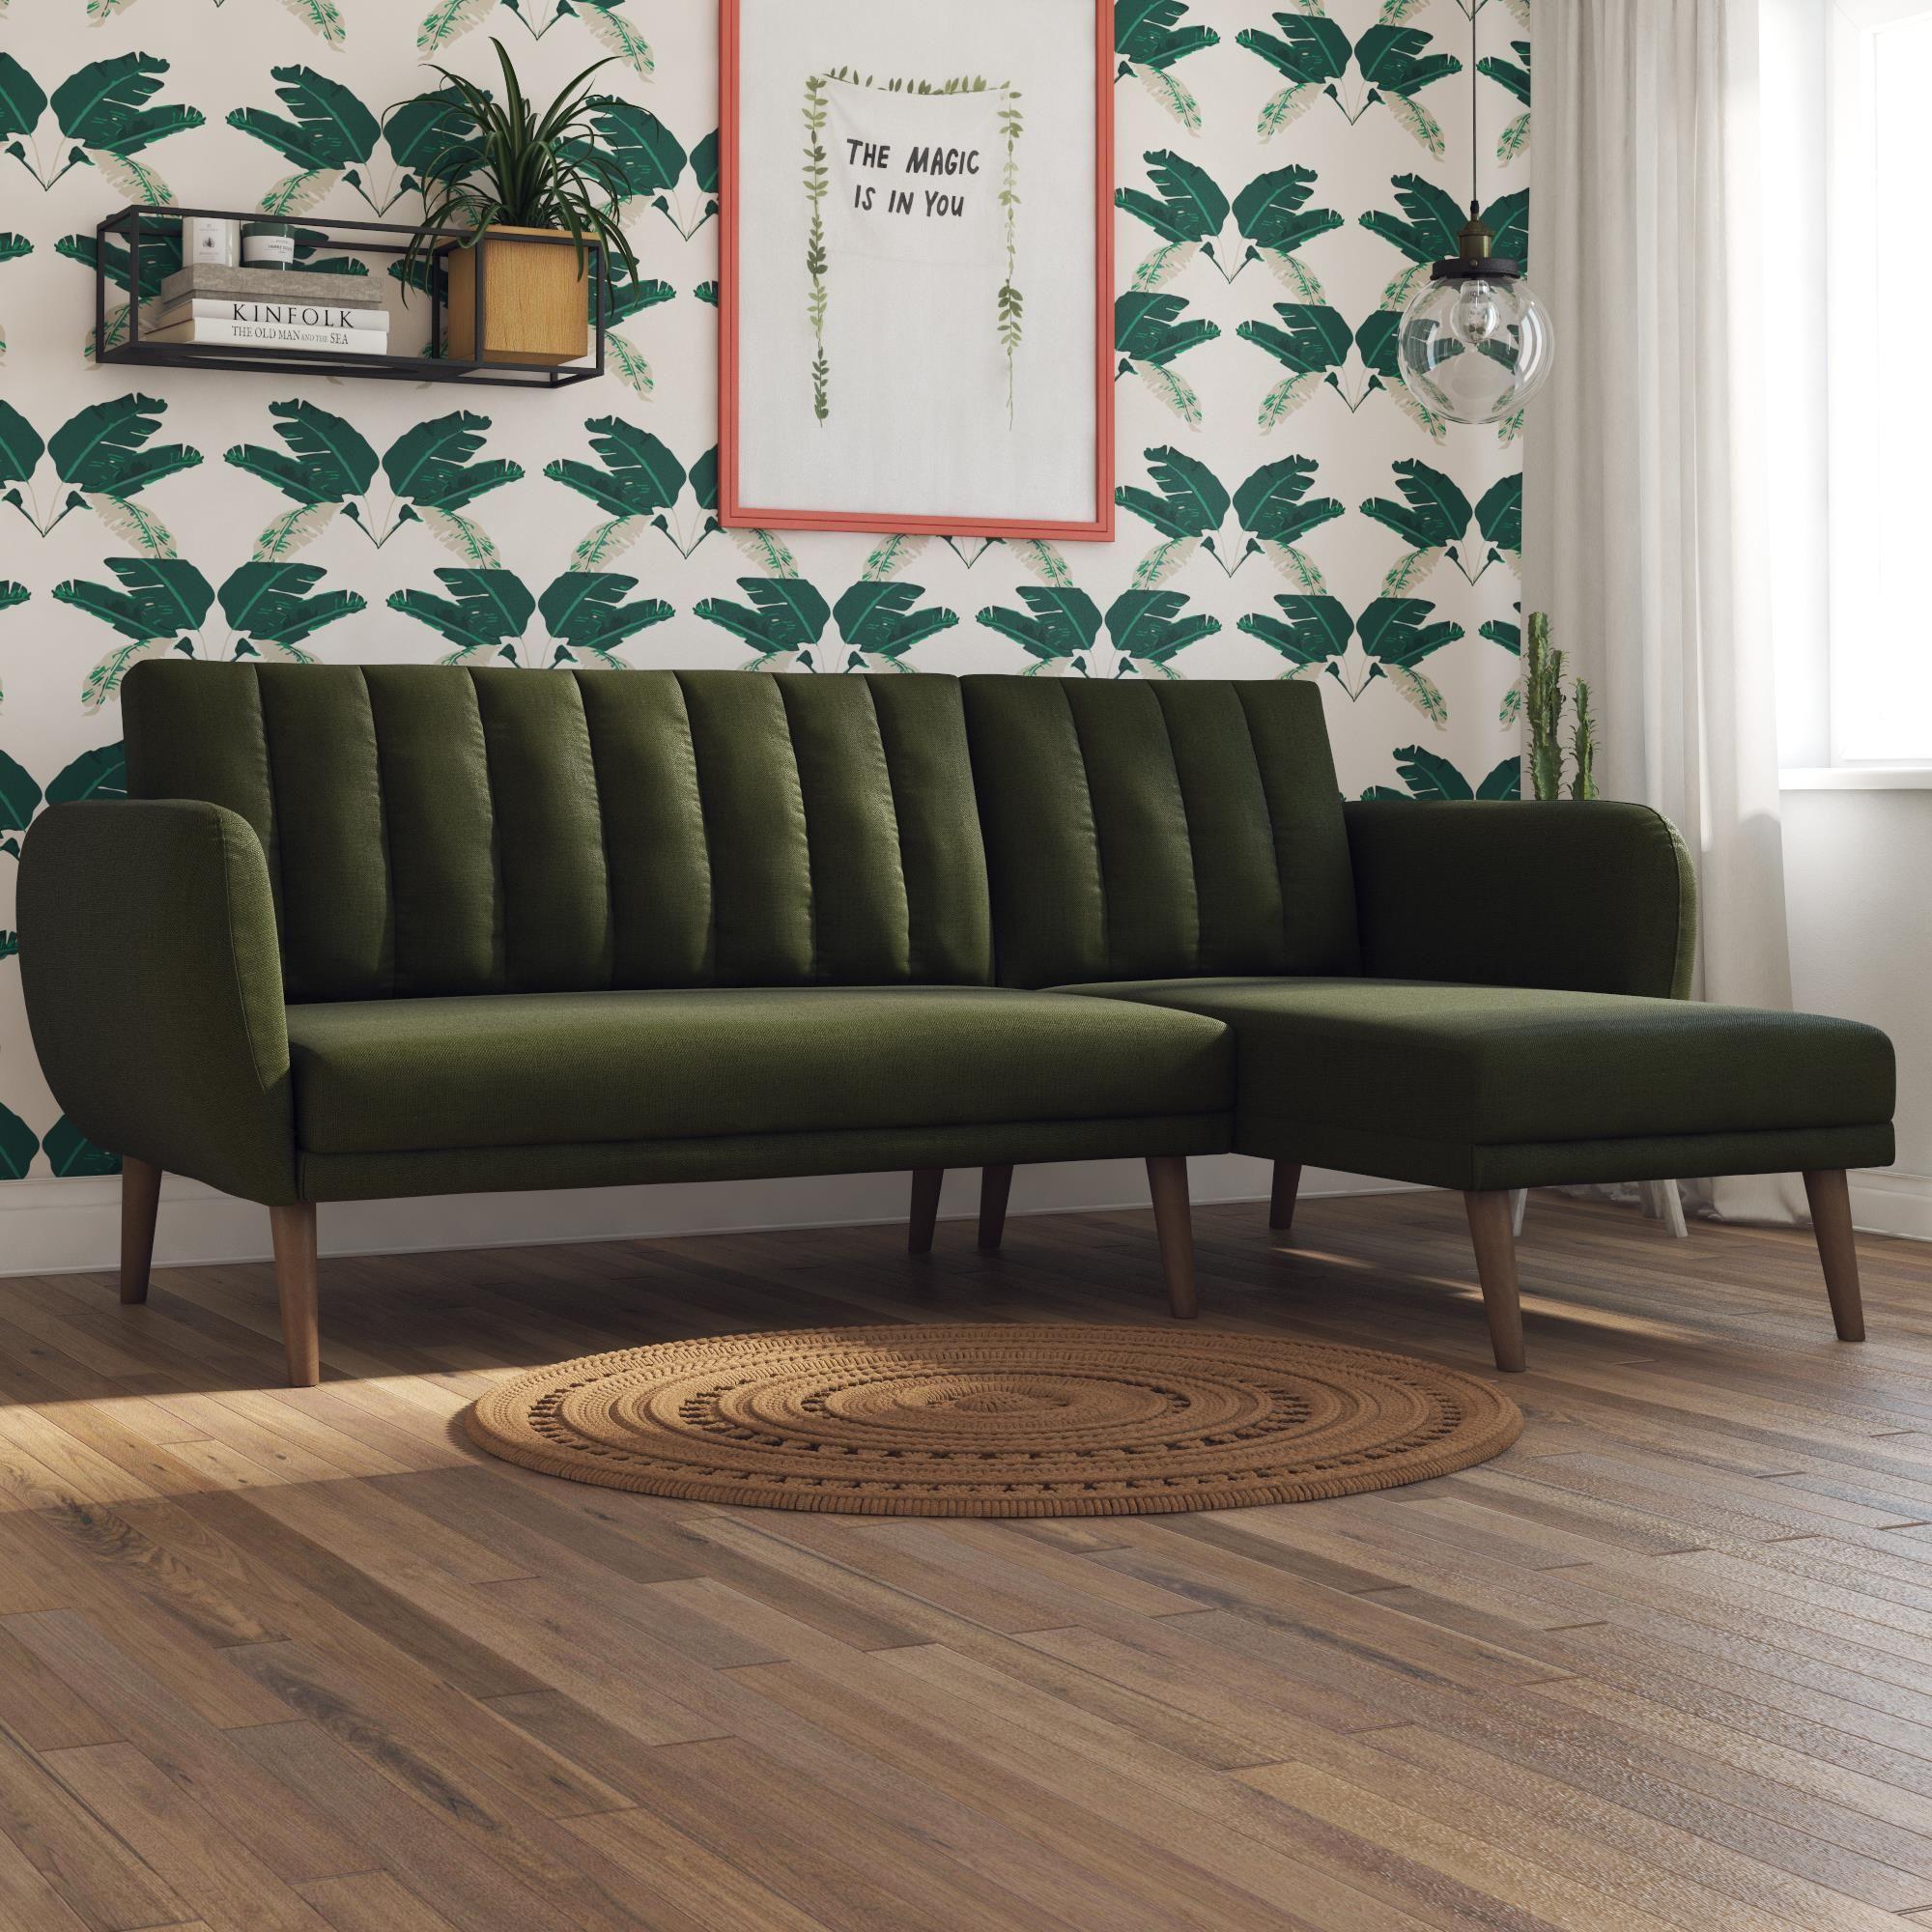 Novogratz Brittany Sectional Futon Sofa Green Linen Walmart Com Sectional Sofa Futon Sofa Chaise Sofa